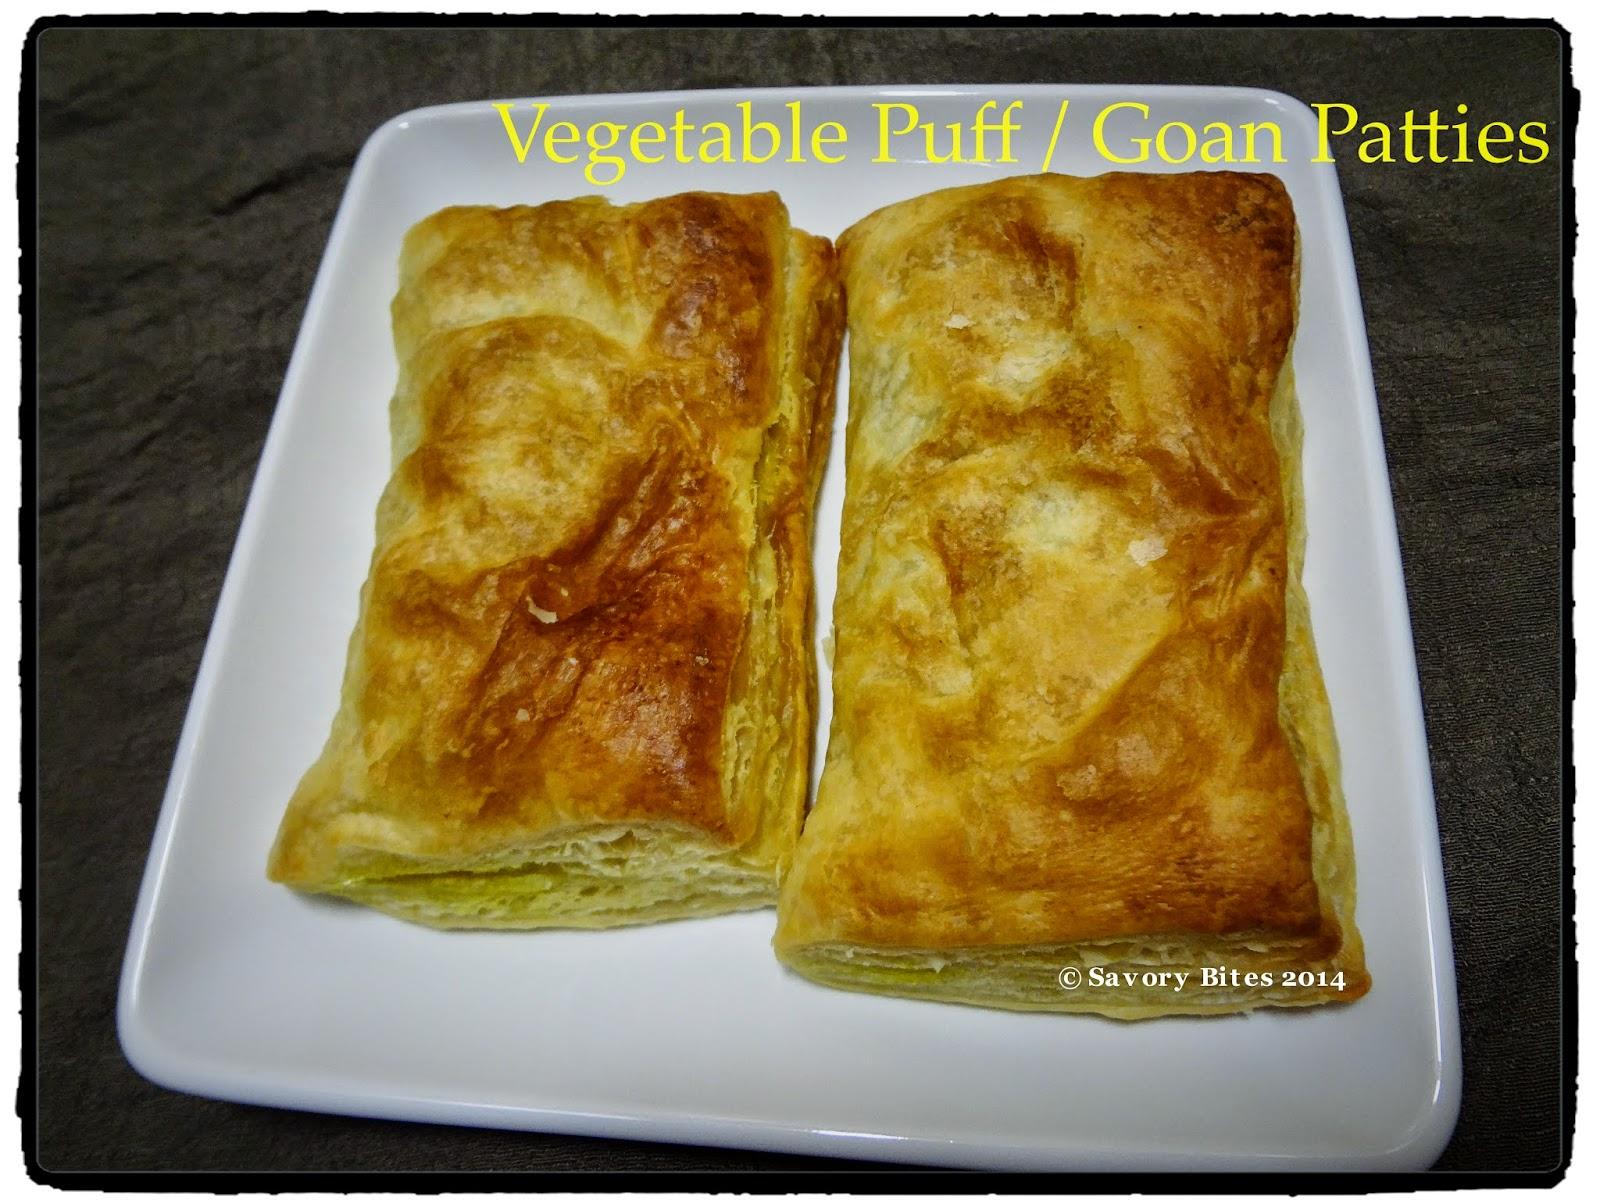 Snacks Goan Patties Vegetable Puff